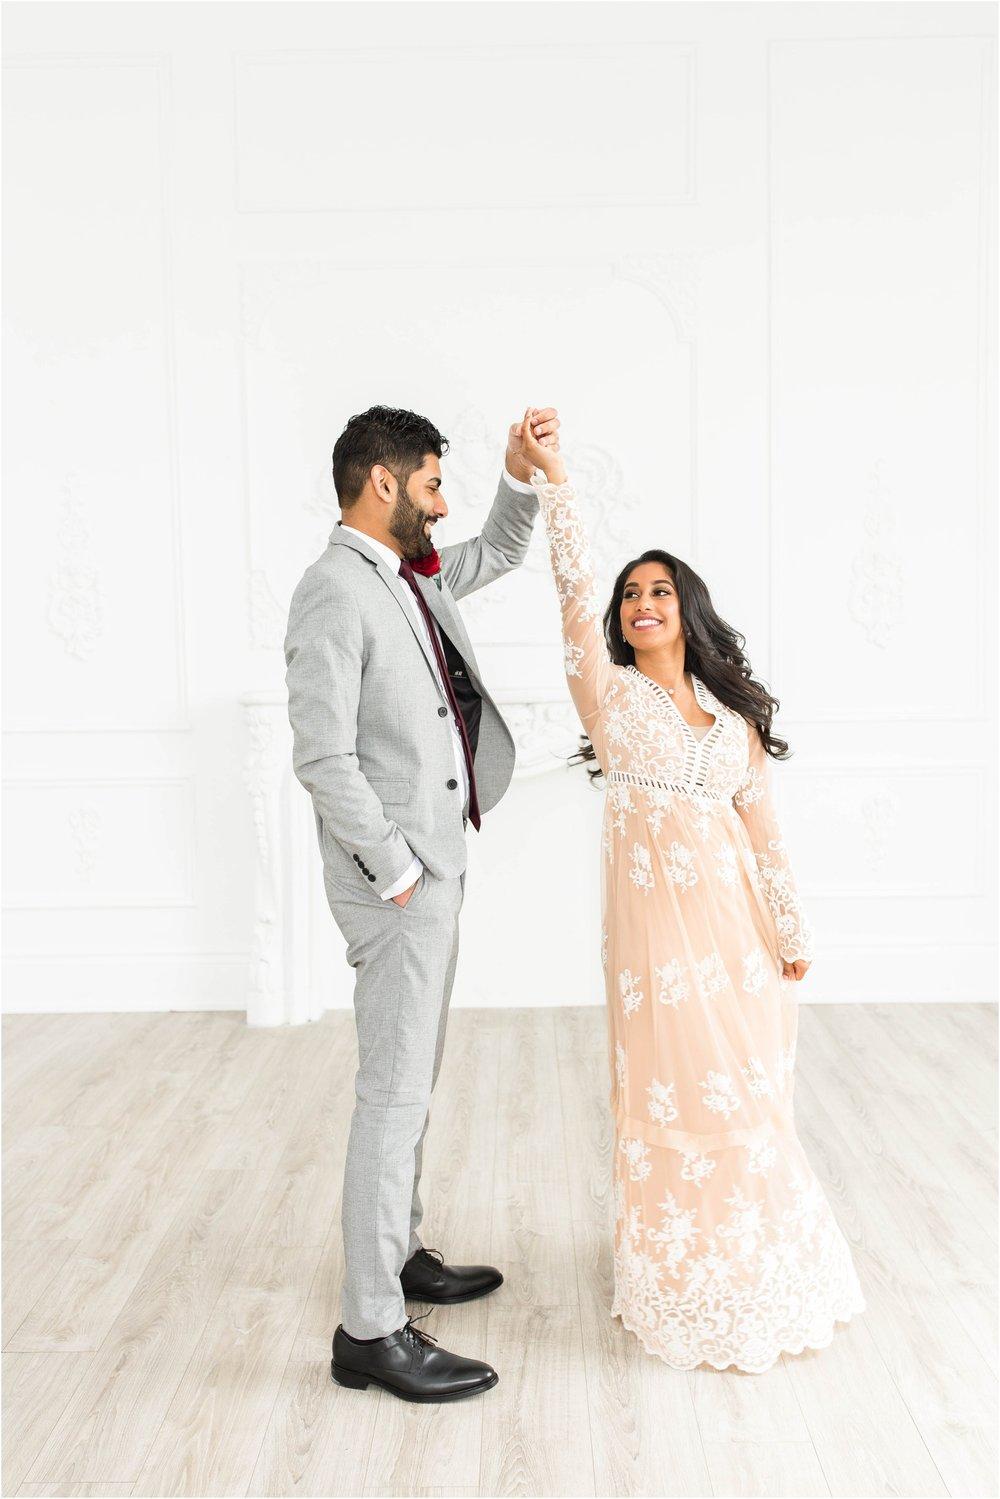 Mint-Room-Studios-Anniversary-Session-Toronto-Mississauga-Brampton-Scarborough-GTA-Pakistani-Indian-Wedding-Engagement-Photographer-Photography_0026.jpg